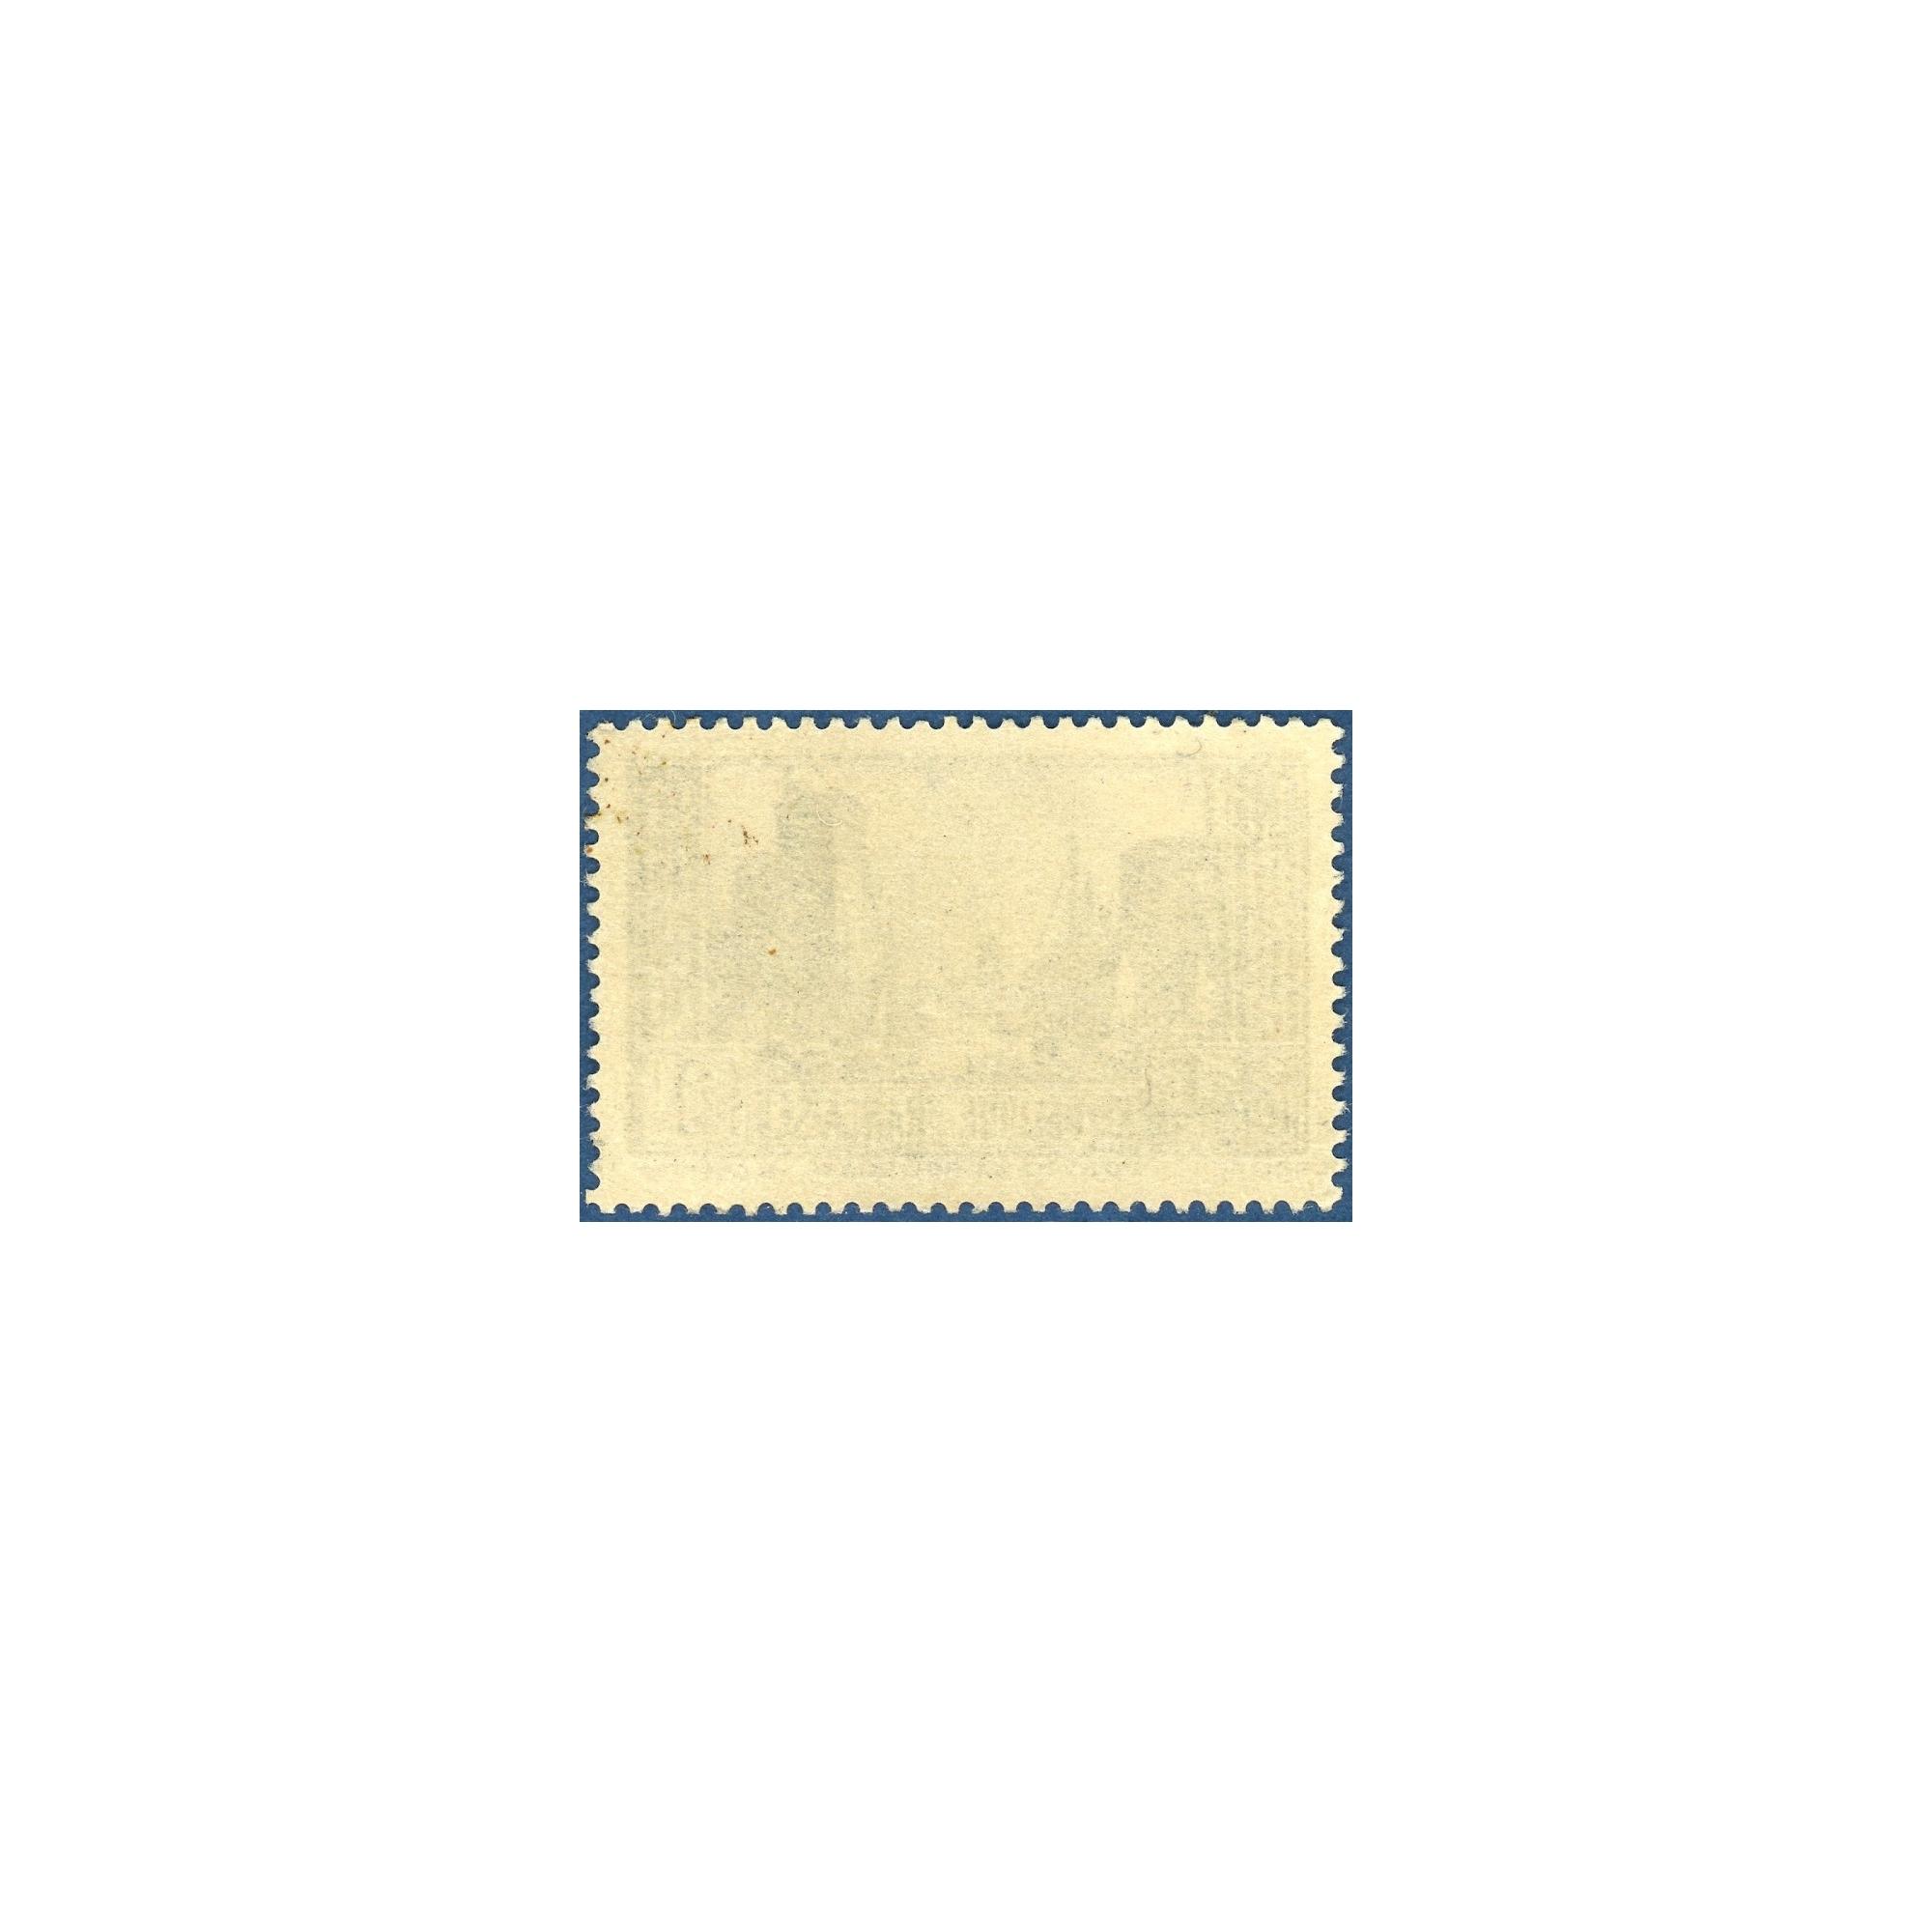 FRANCE N°261, PORT DE LA ROCHELLE, TIMBRE NEUF ,1929-31